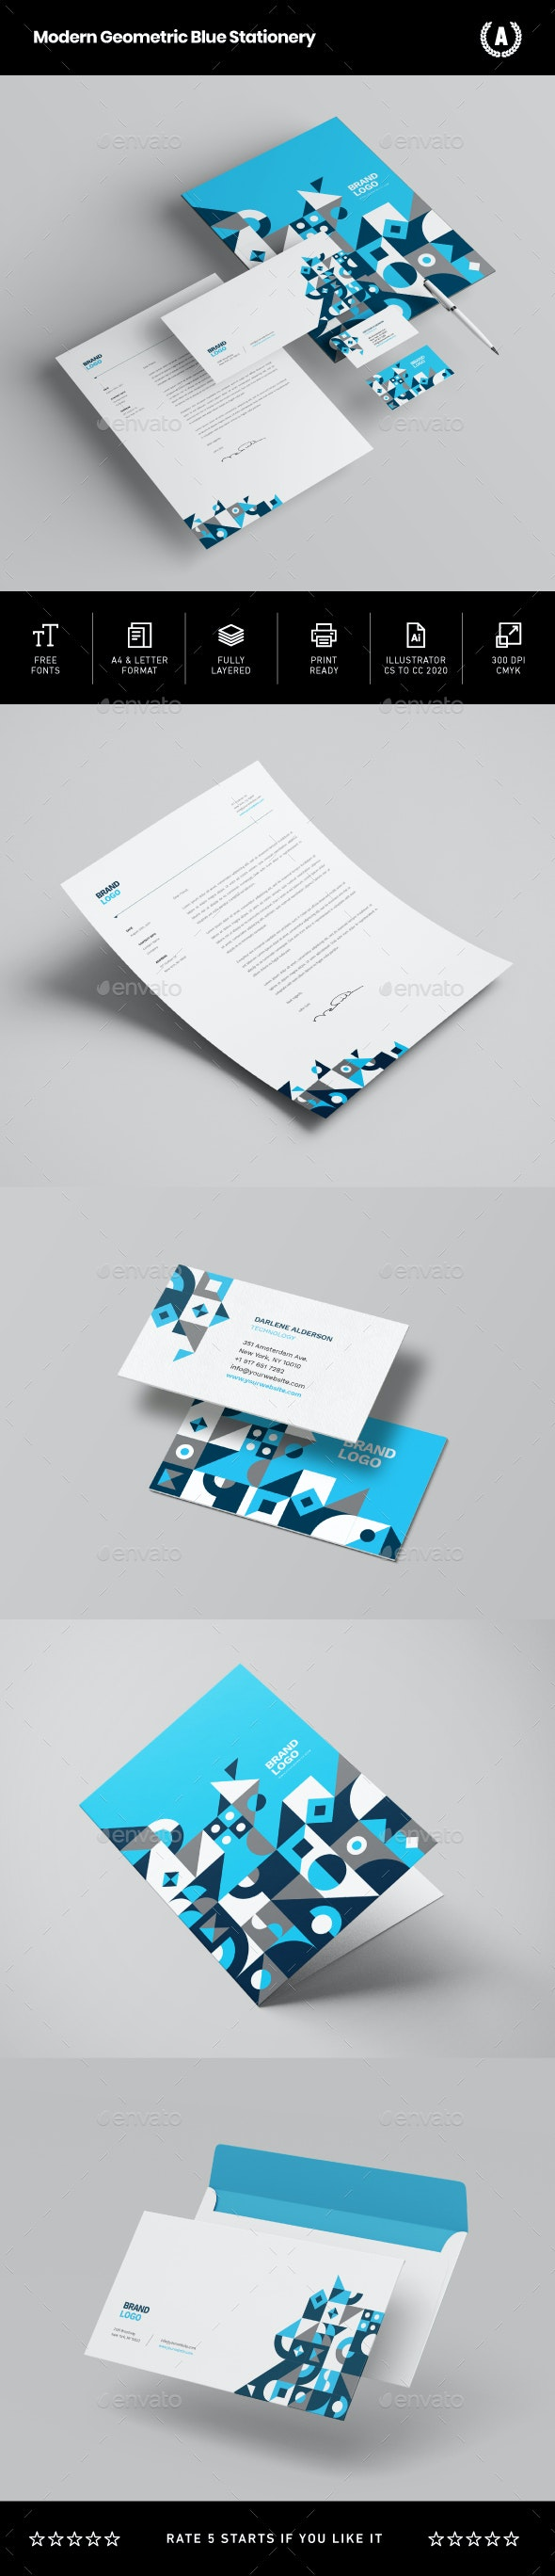 Modern Geometric Blue Stationery - Stationery Print Templates